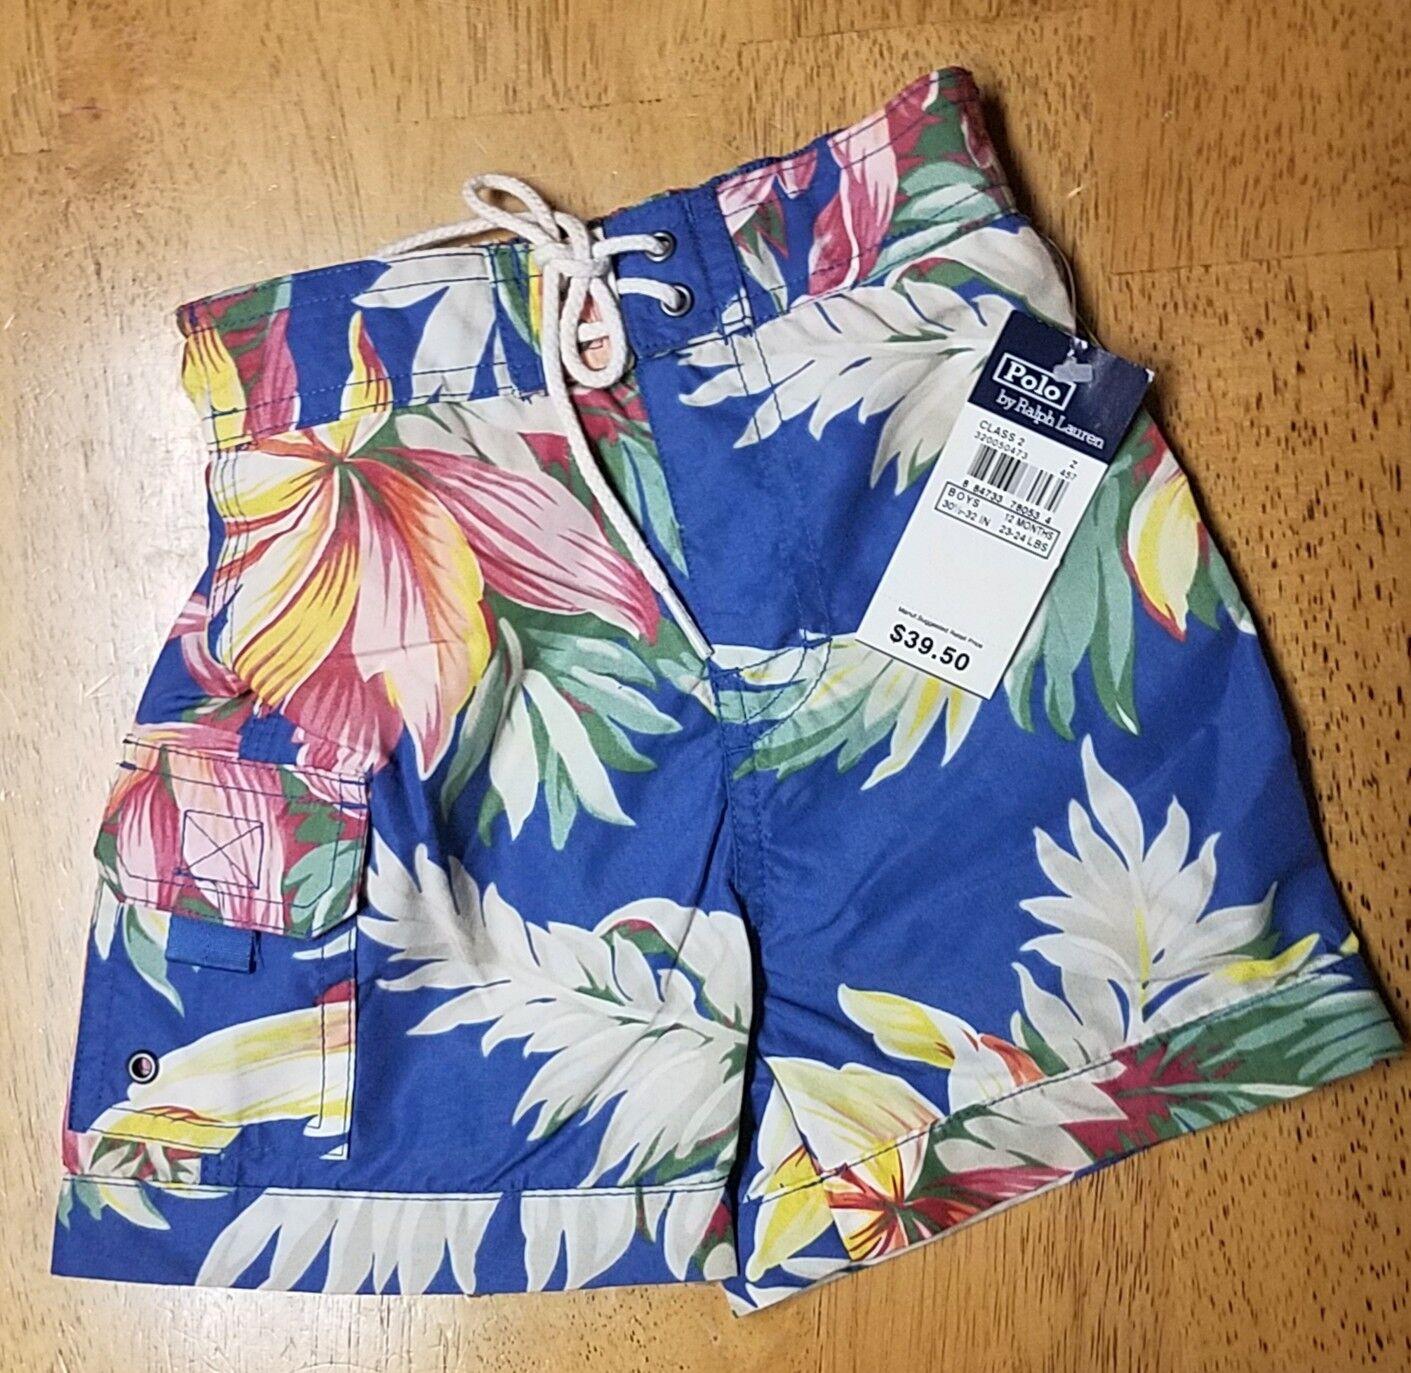 0b360cf6a Polo by Ralph Lauren Tropcial Hawaiian Swim Trunks Suit Shorts ...